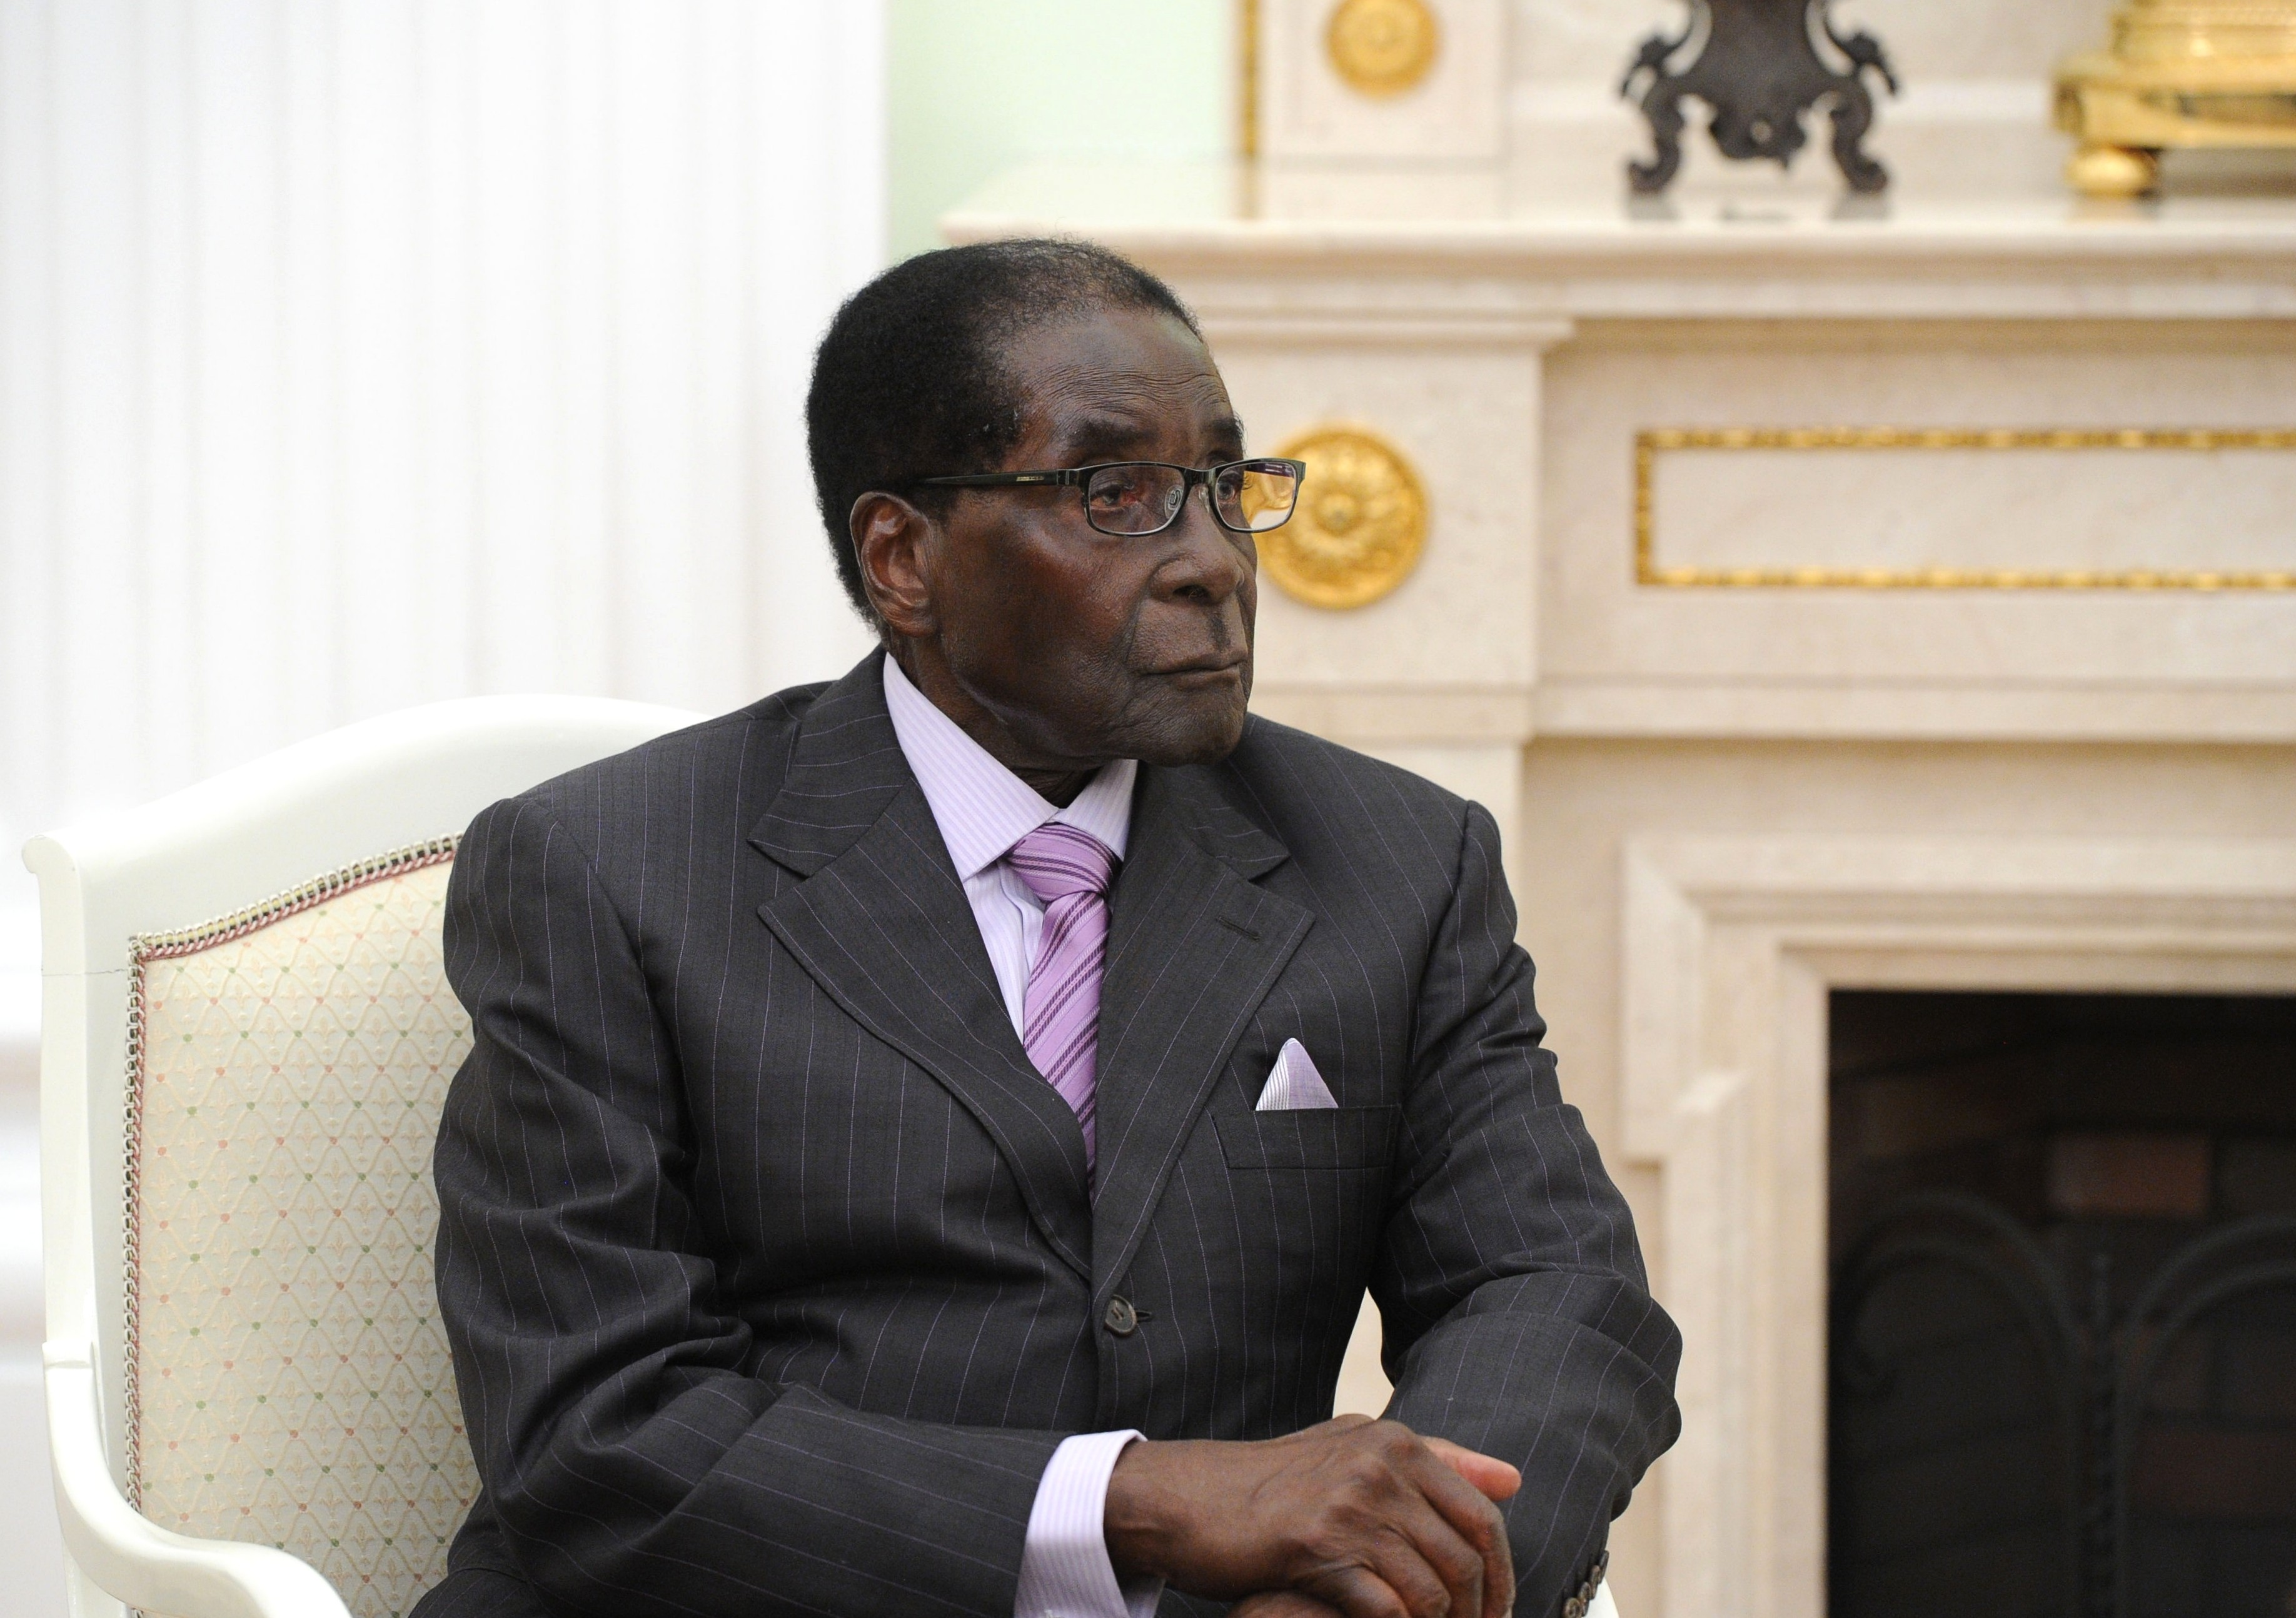 <p>Президент Республики Зимбабве Роберт Мугабе. Фото: &copy; РИА Новости/Михаил Климентьев</p>